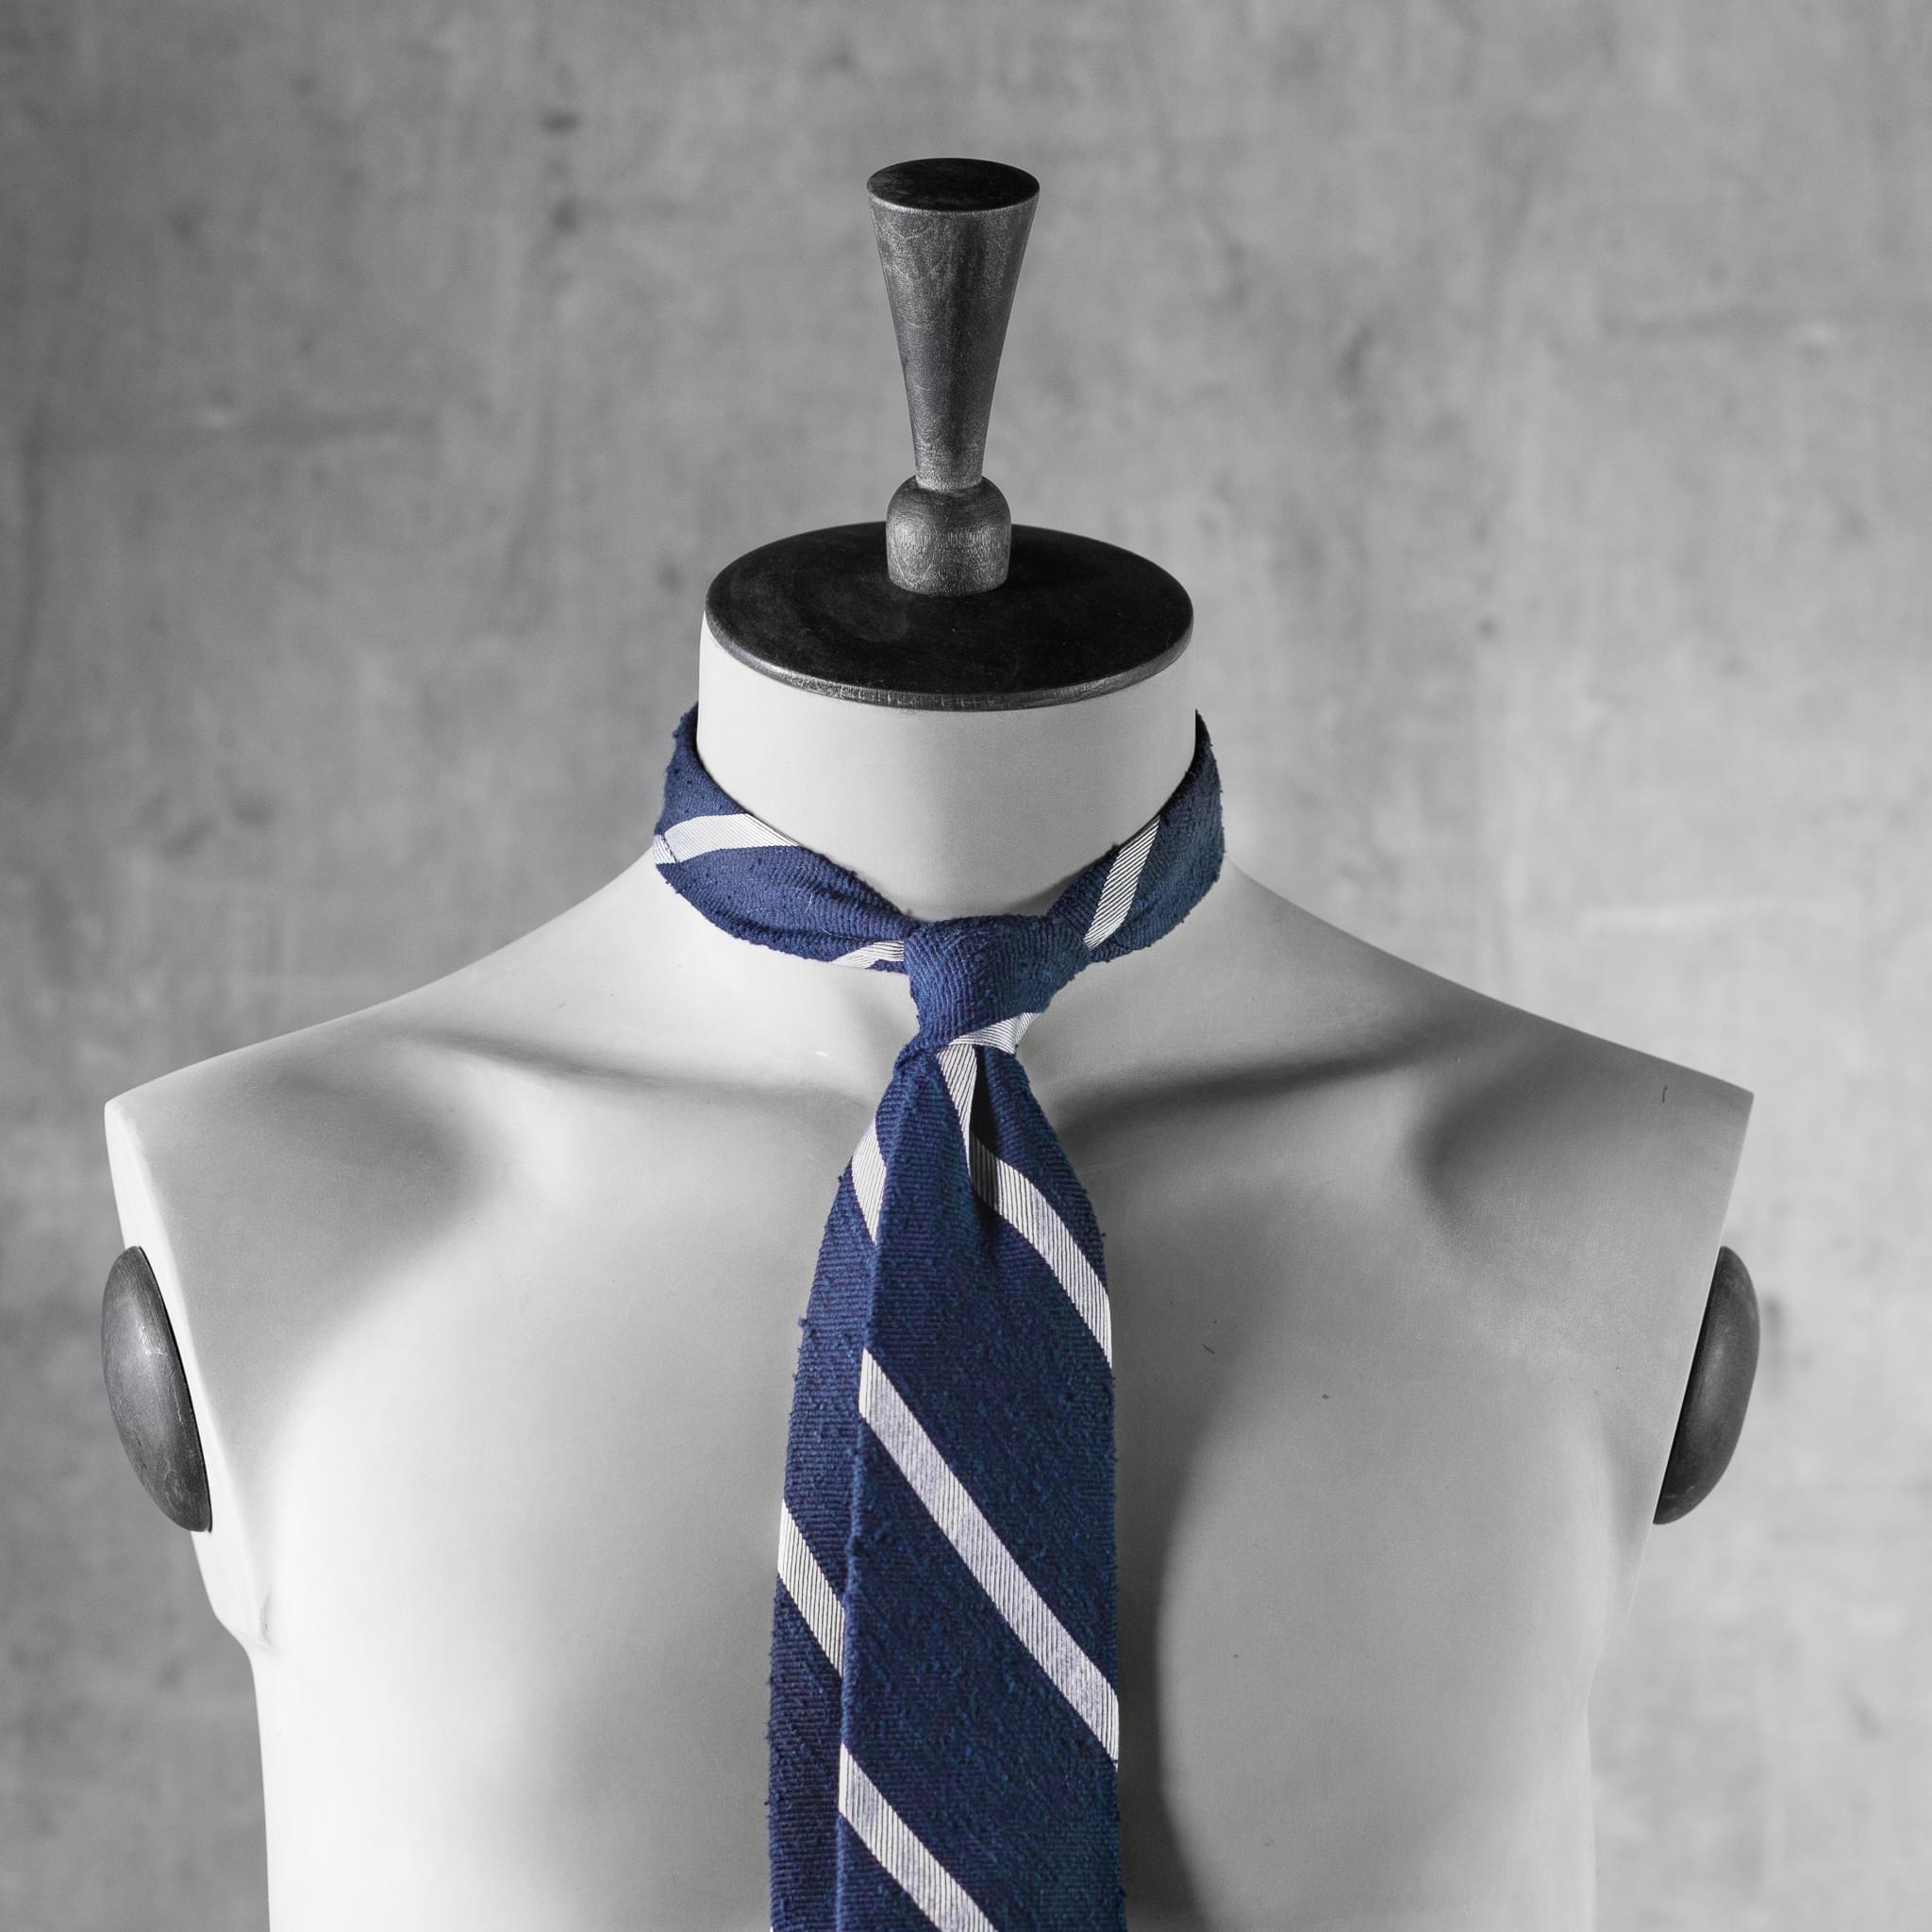 SHANTUNG-0361-Tie-Initials-Corbata-Iniciales-The-Seelk-4